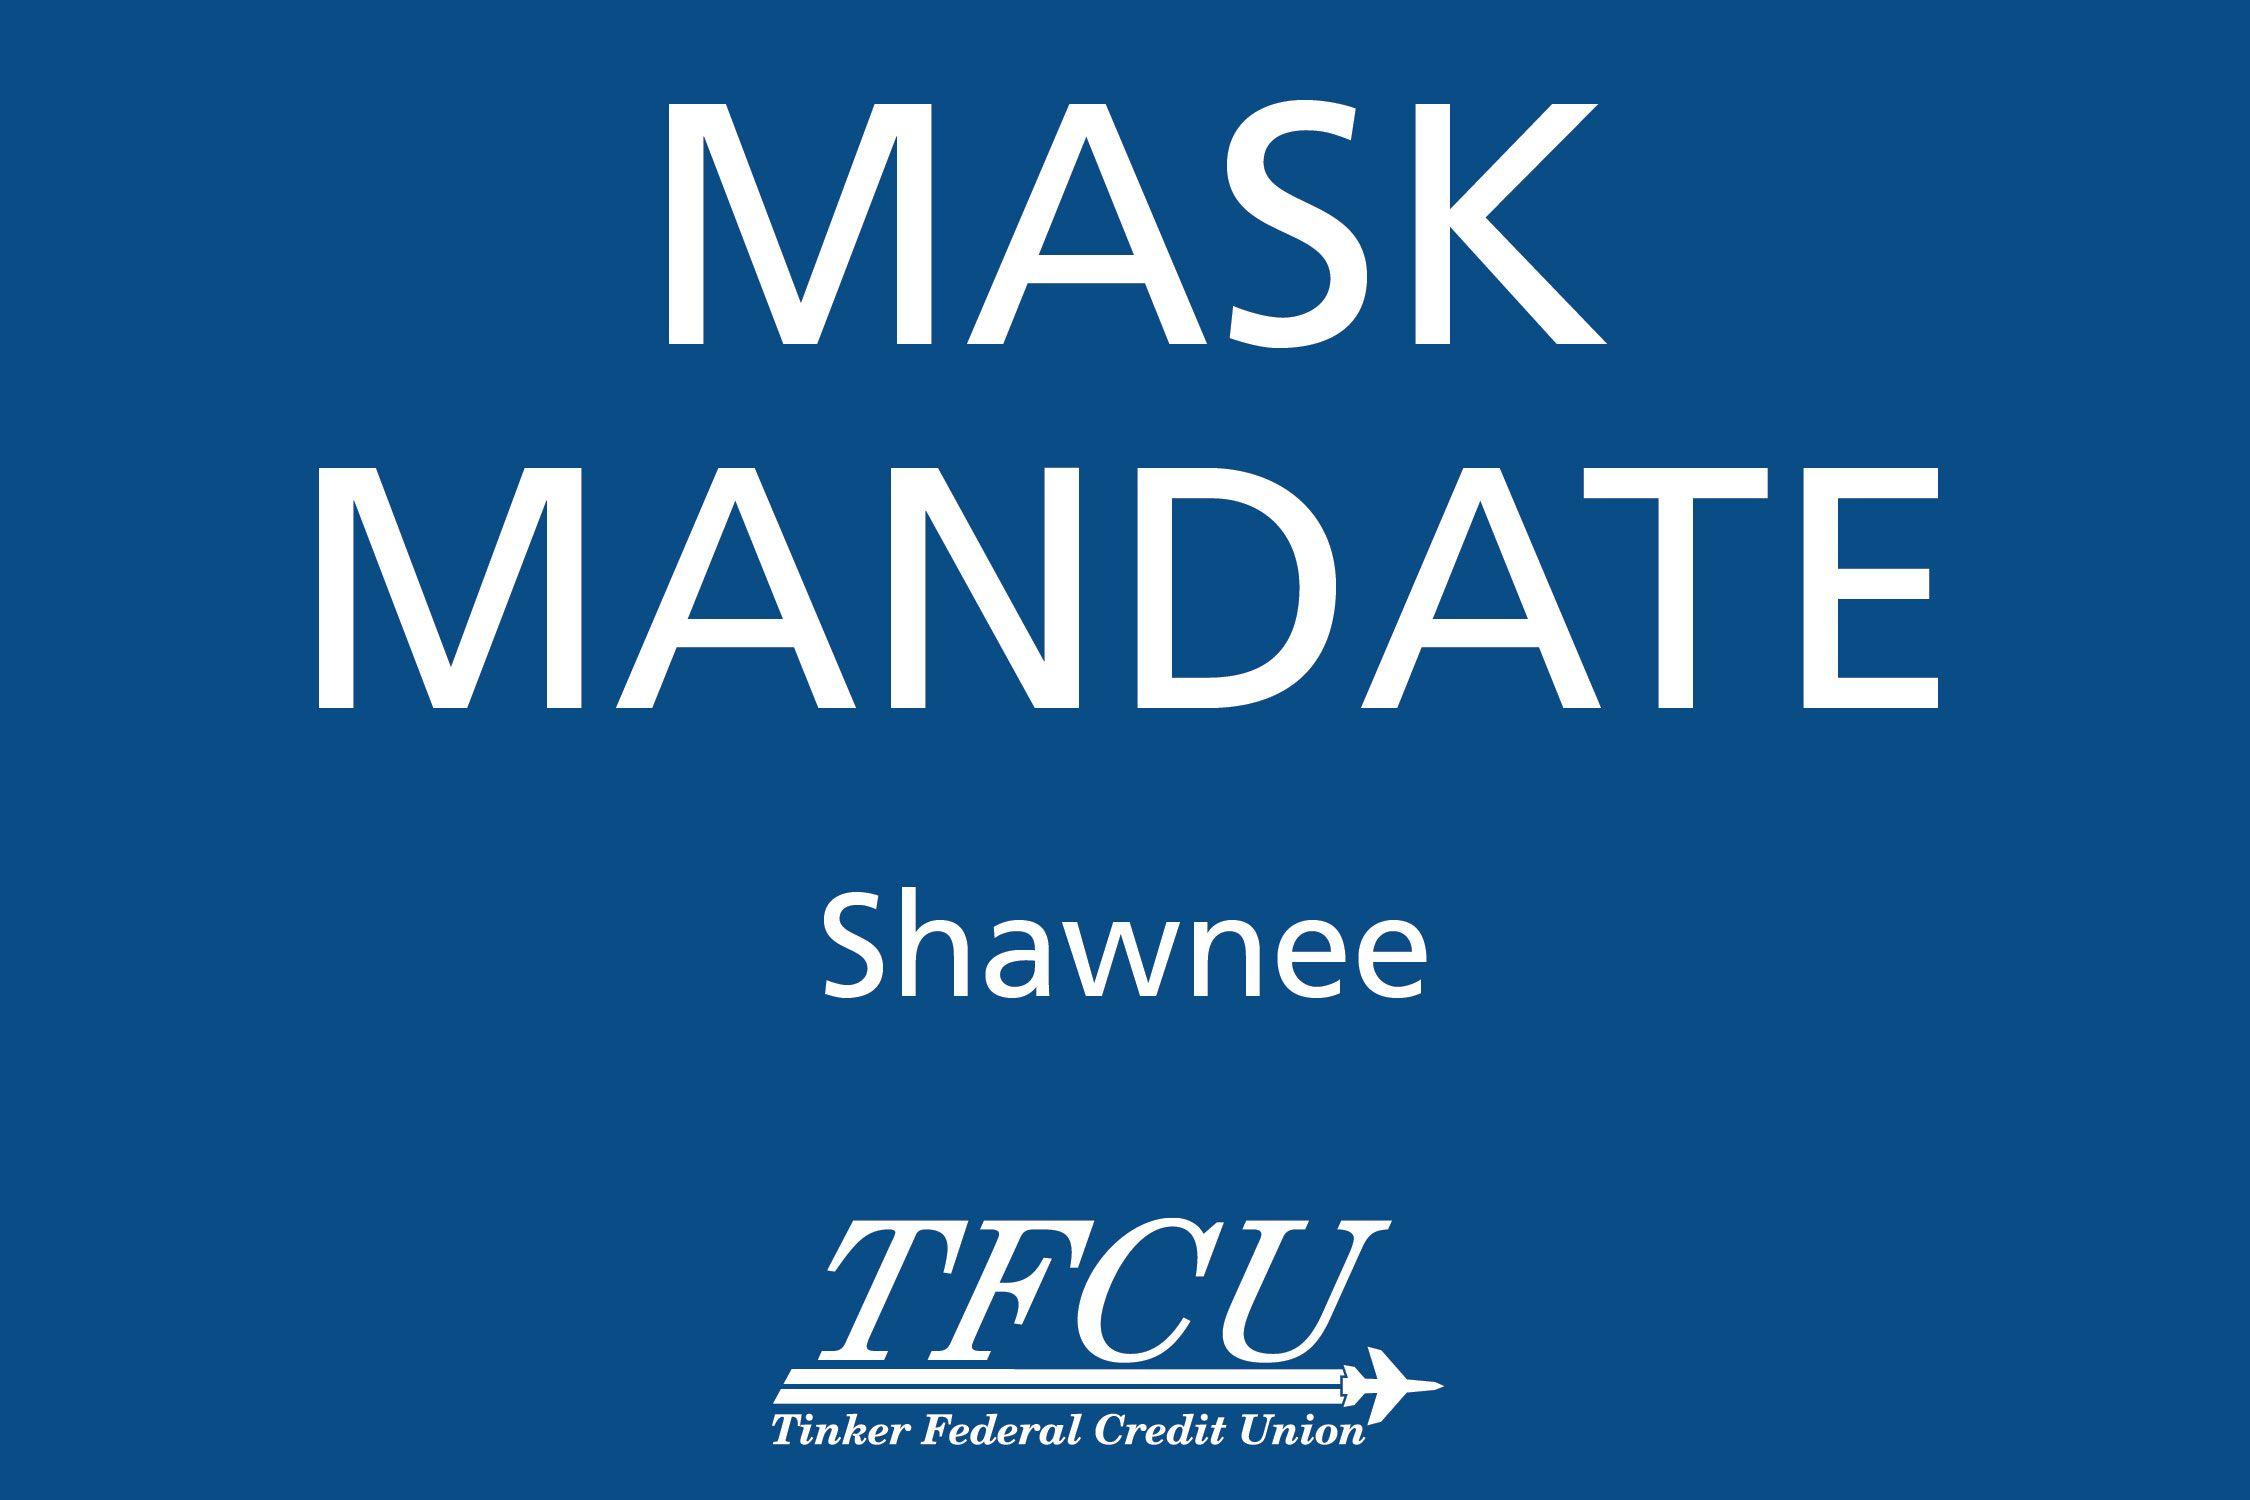 Mask Mandate Shawnee